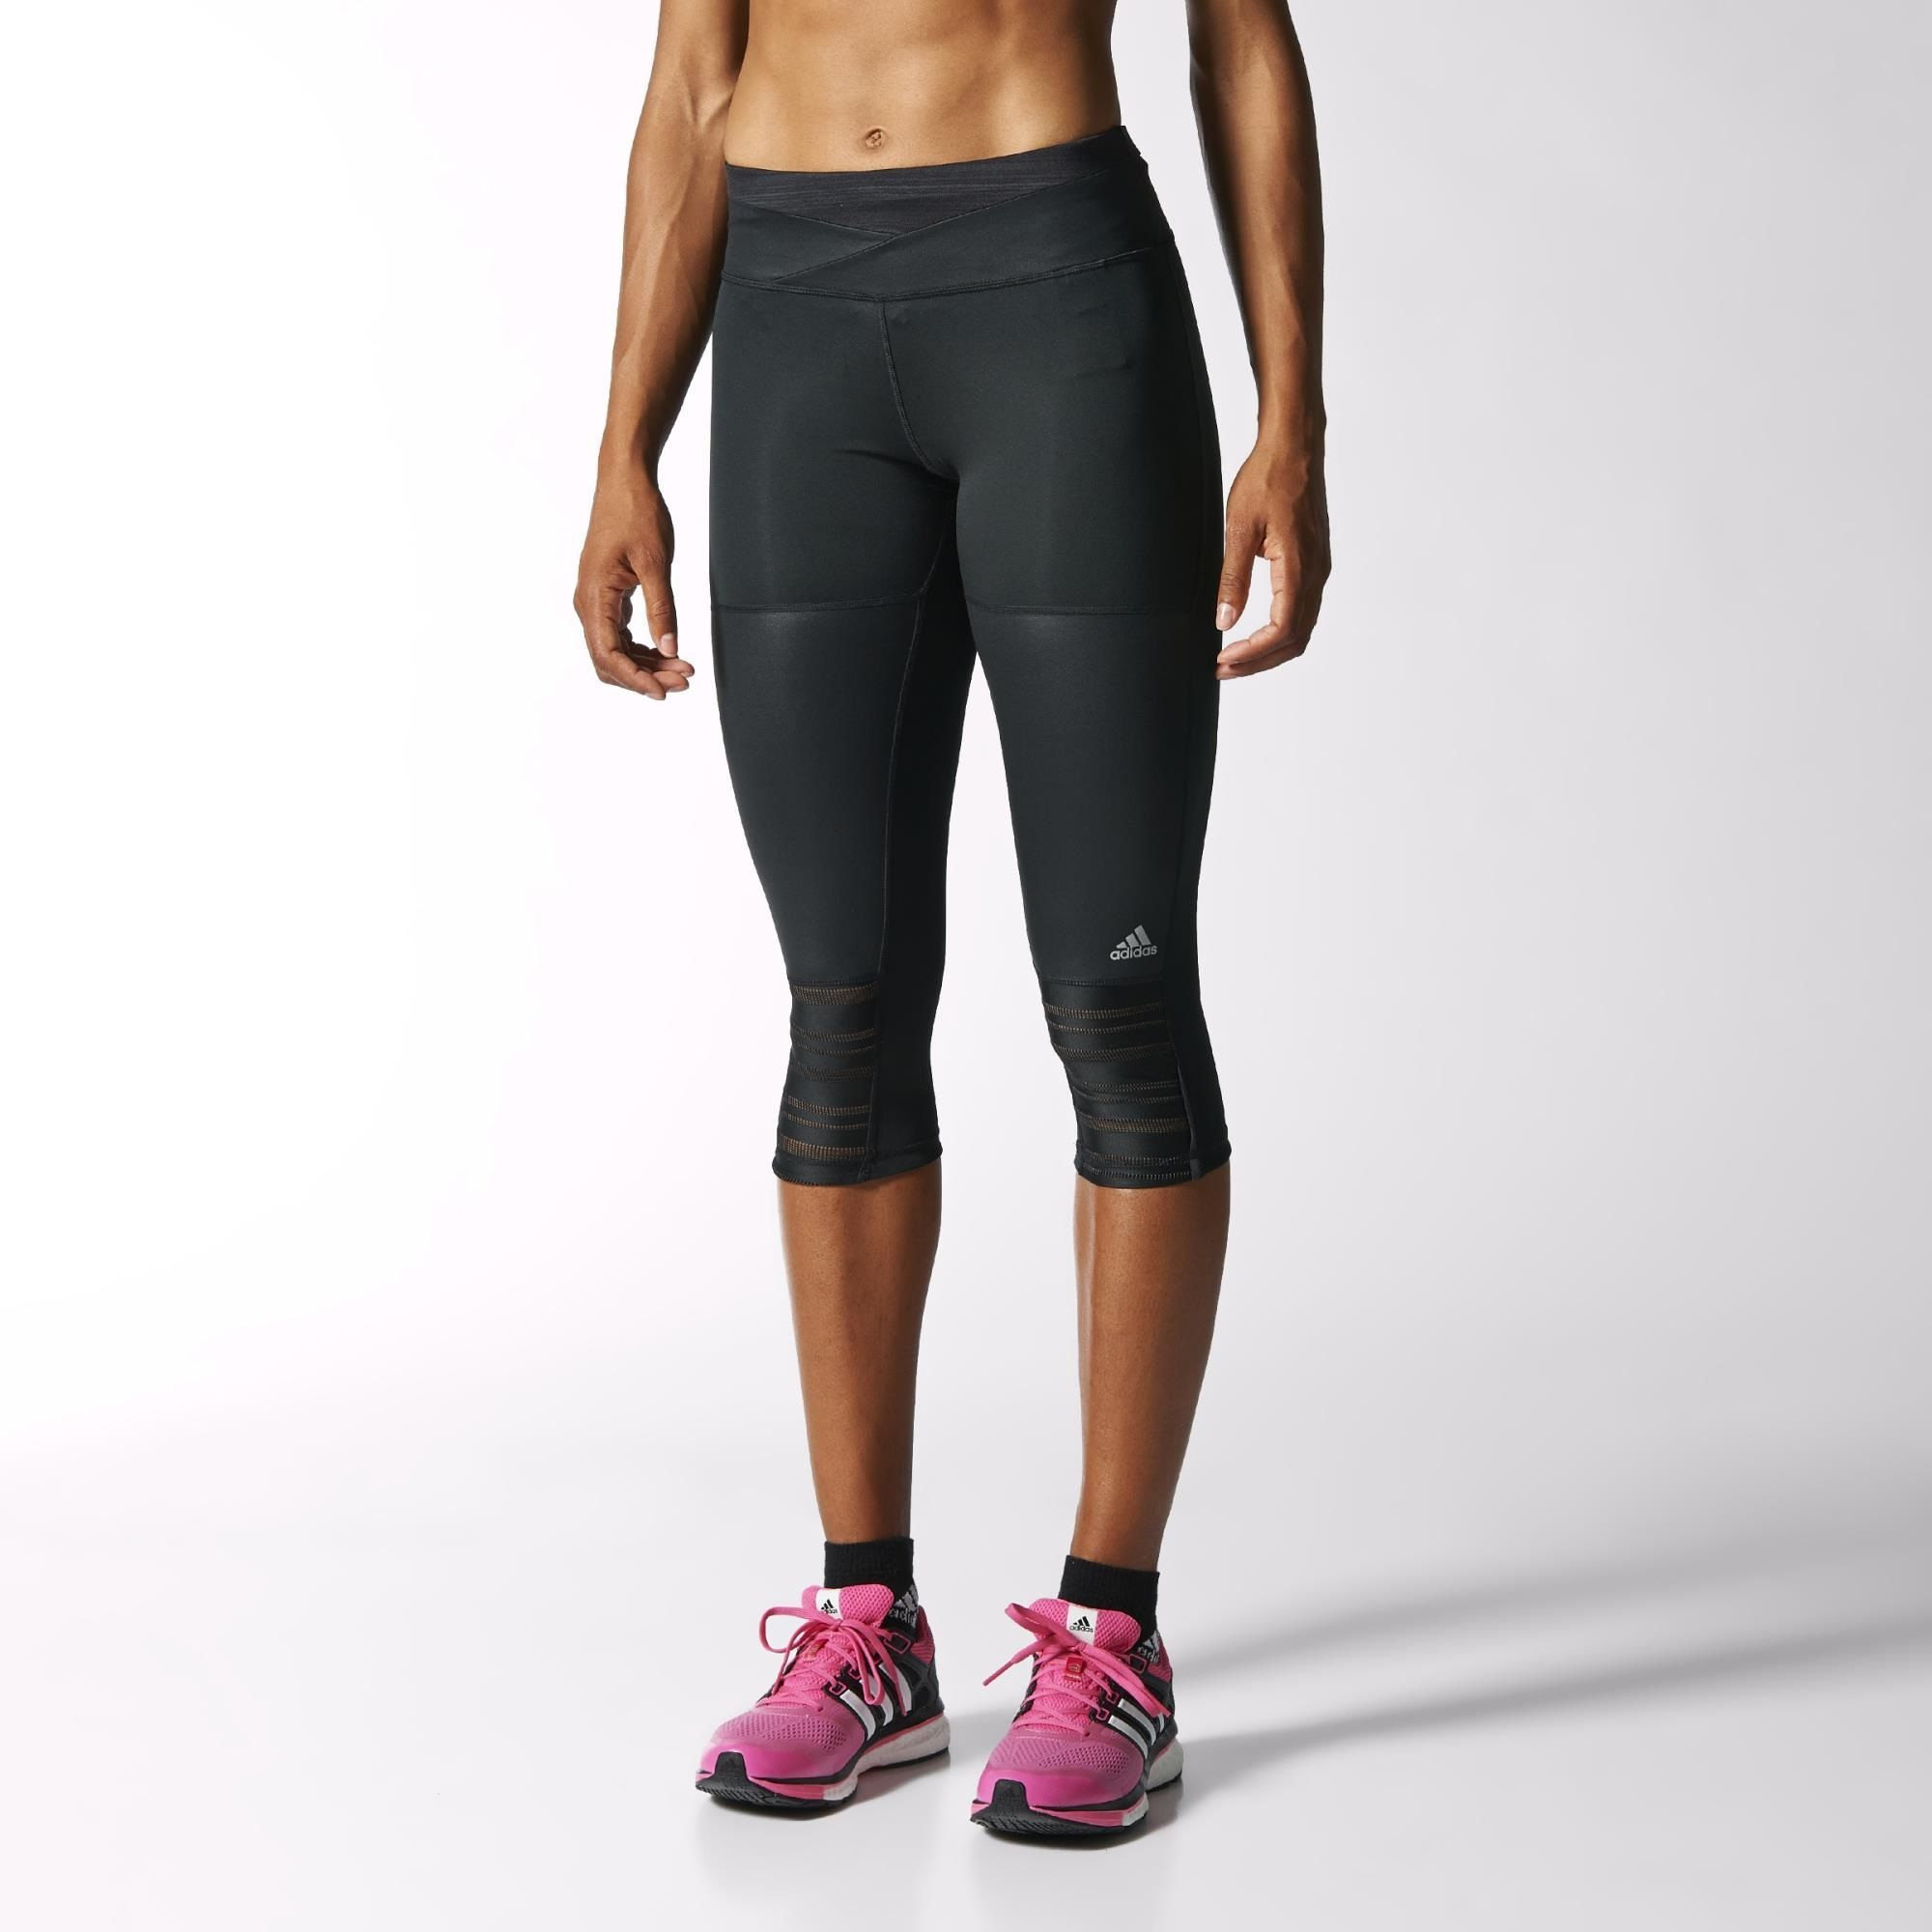 Shop our official selection of adidas Black - Supernova - Tights at adidas.